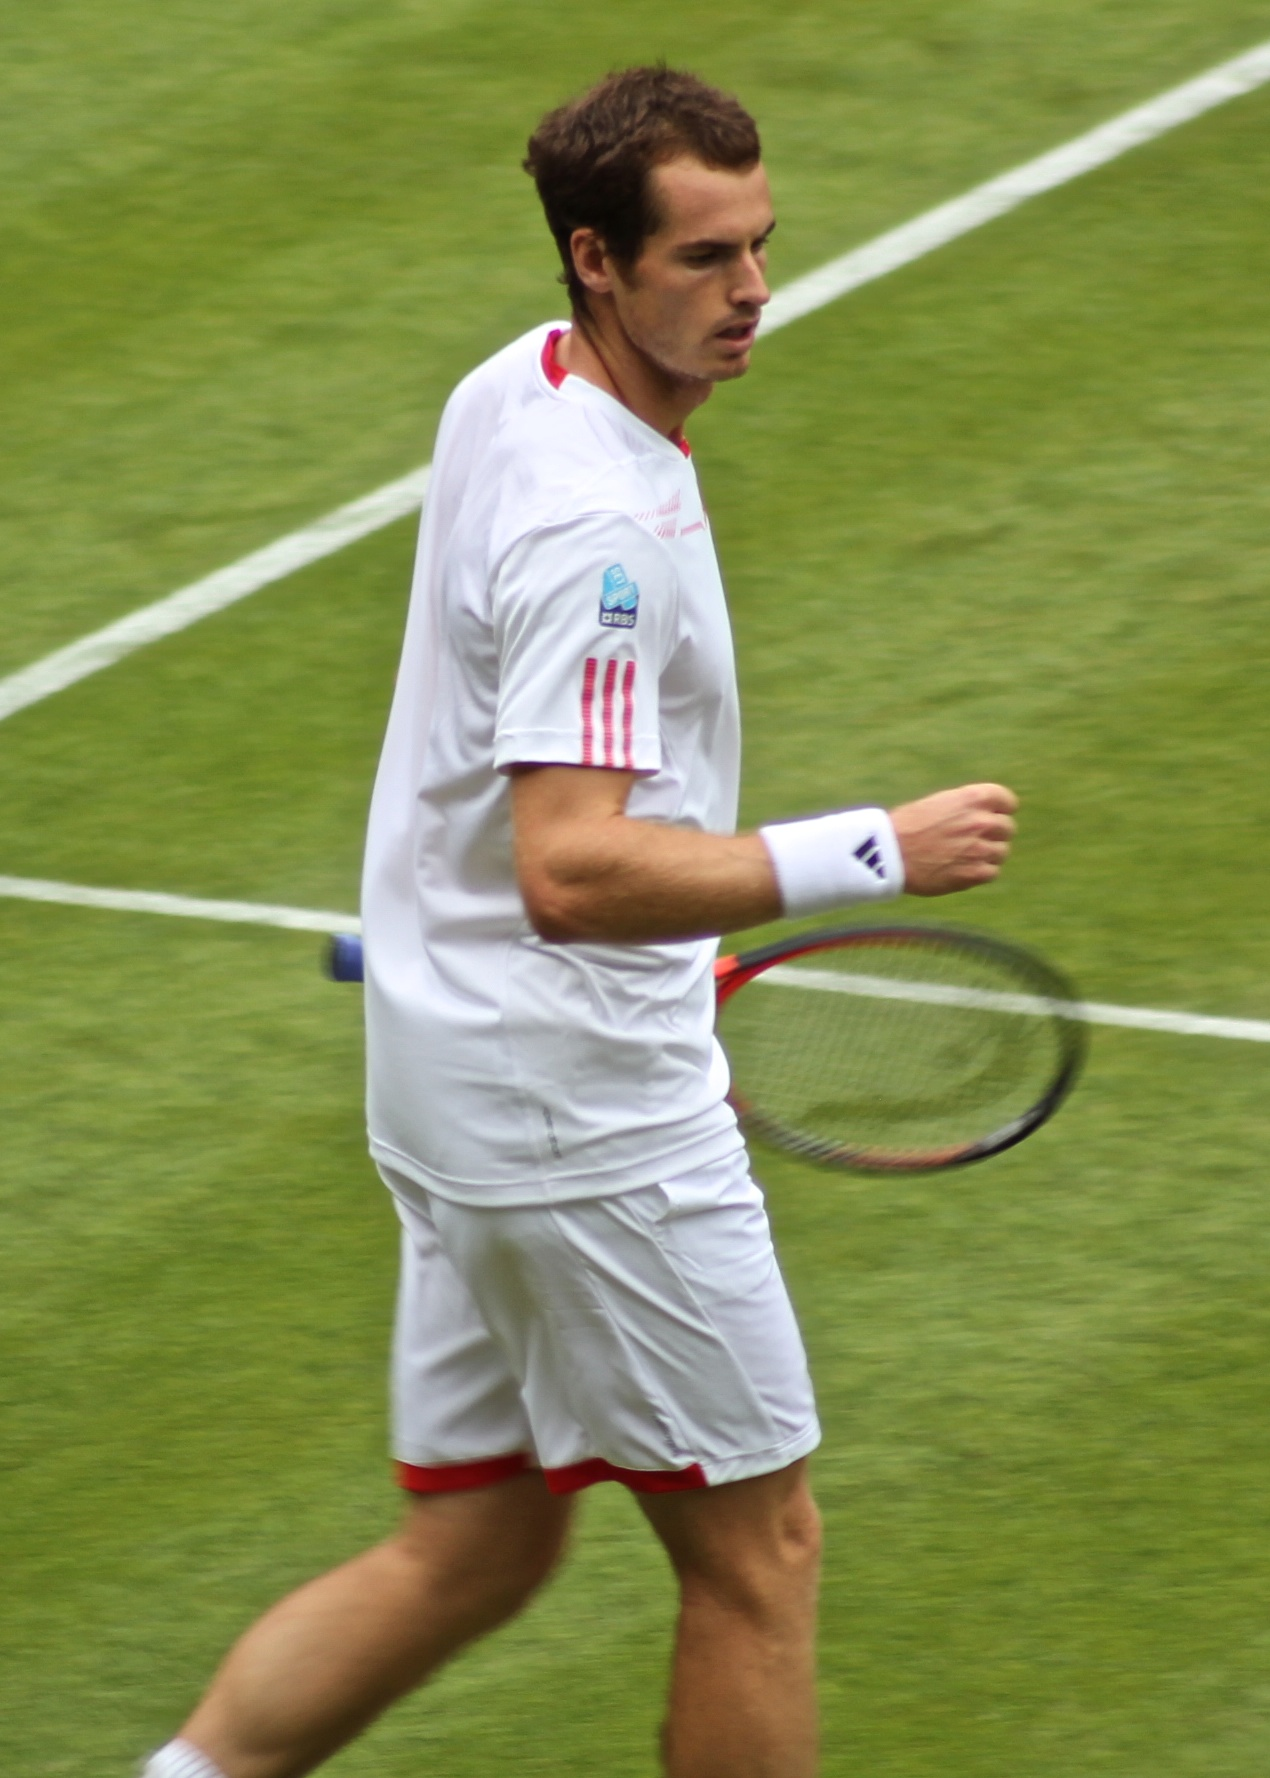 Andy Murray Wimbledon Tennis Shoes